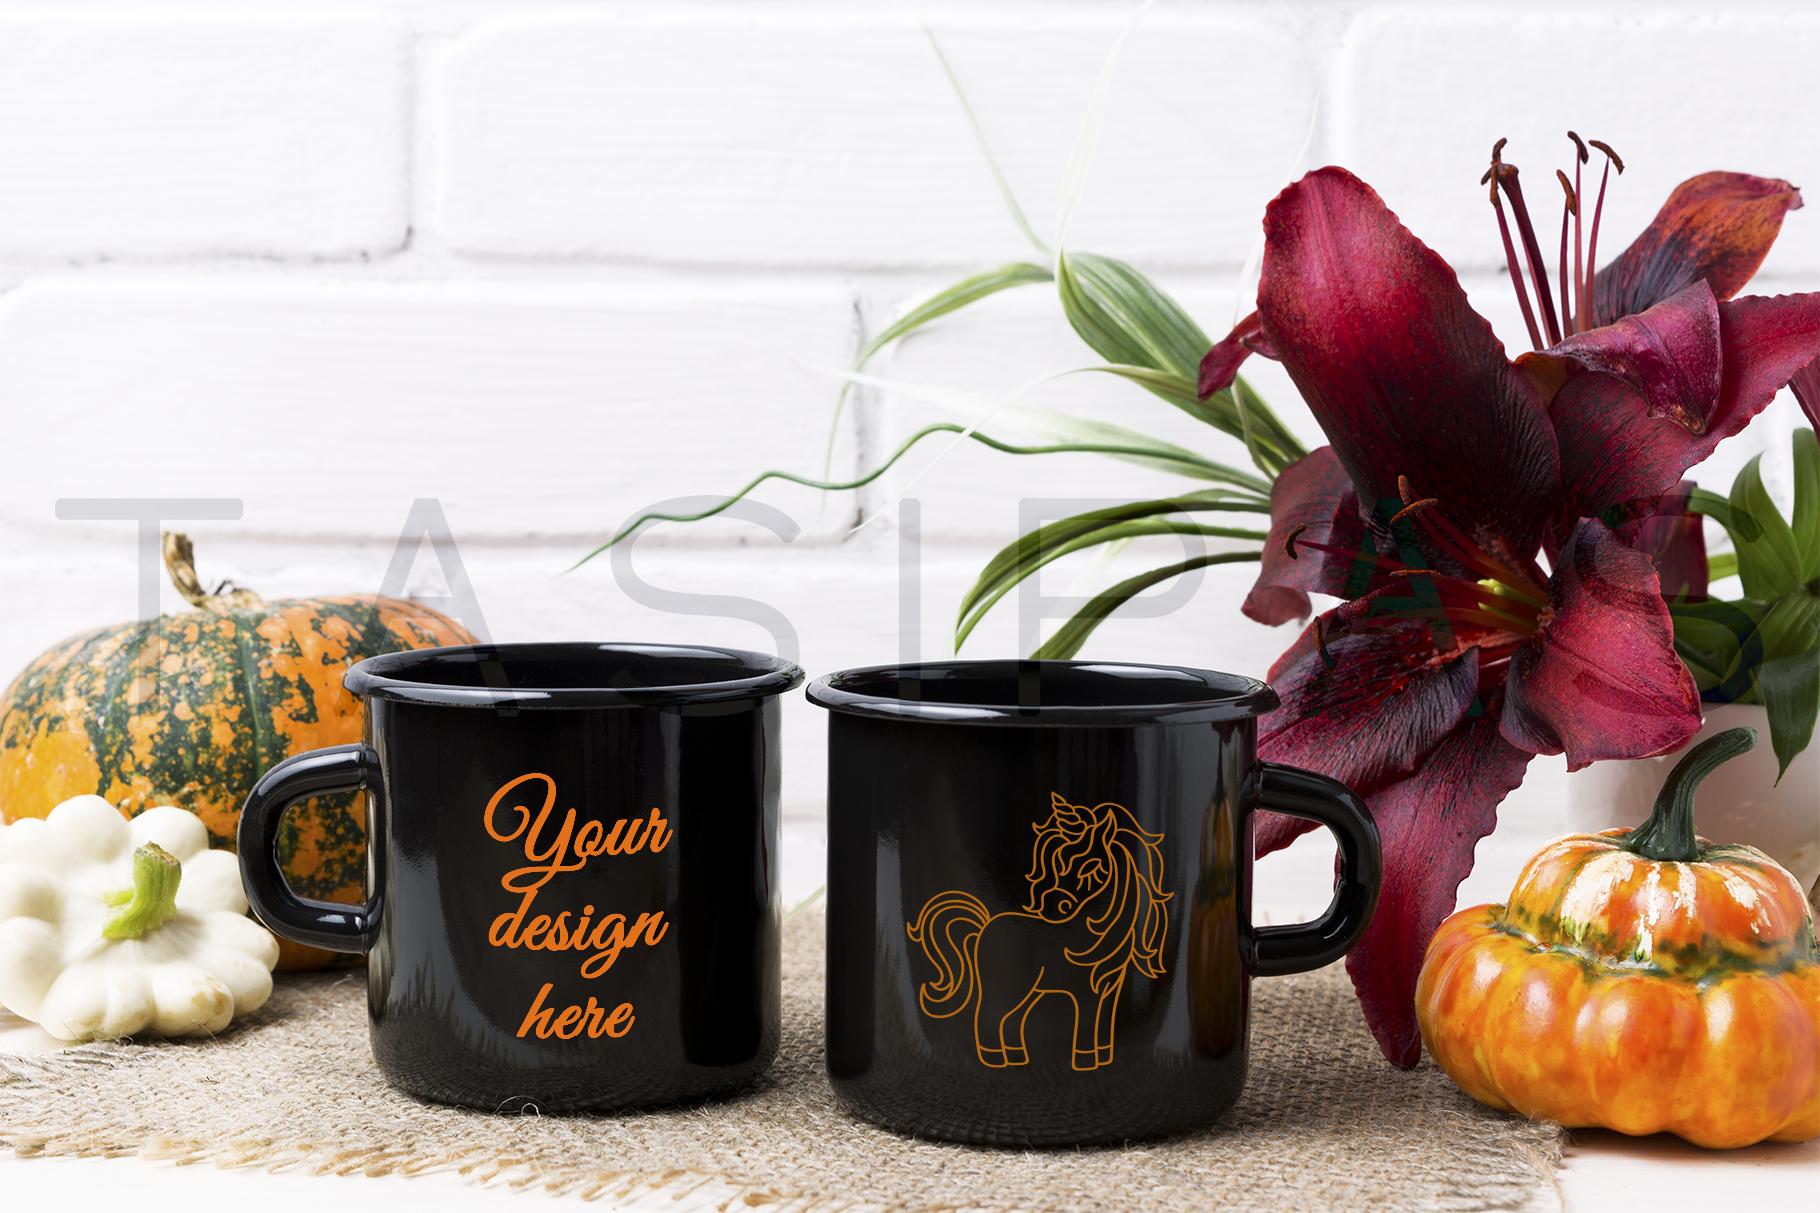 Two black campfire enamel mug mockup with pumpkin example image 1